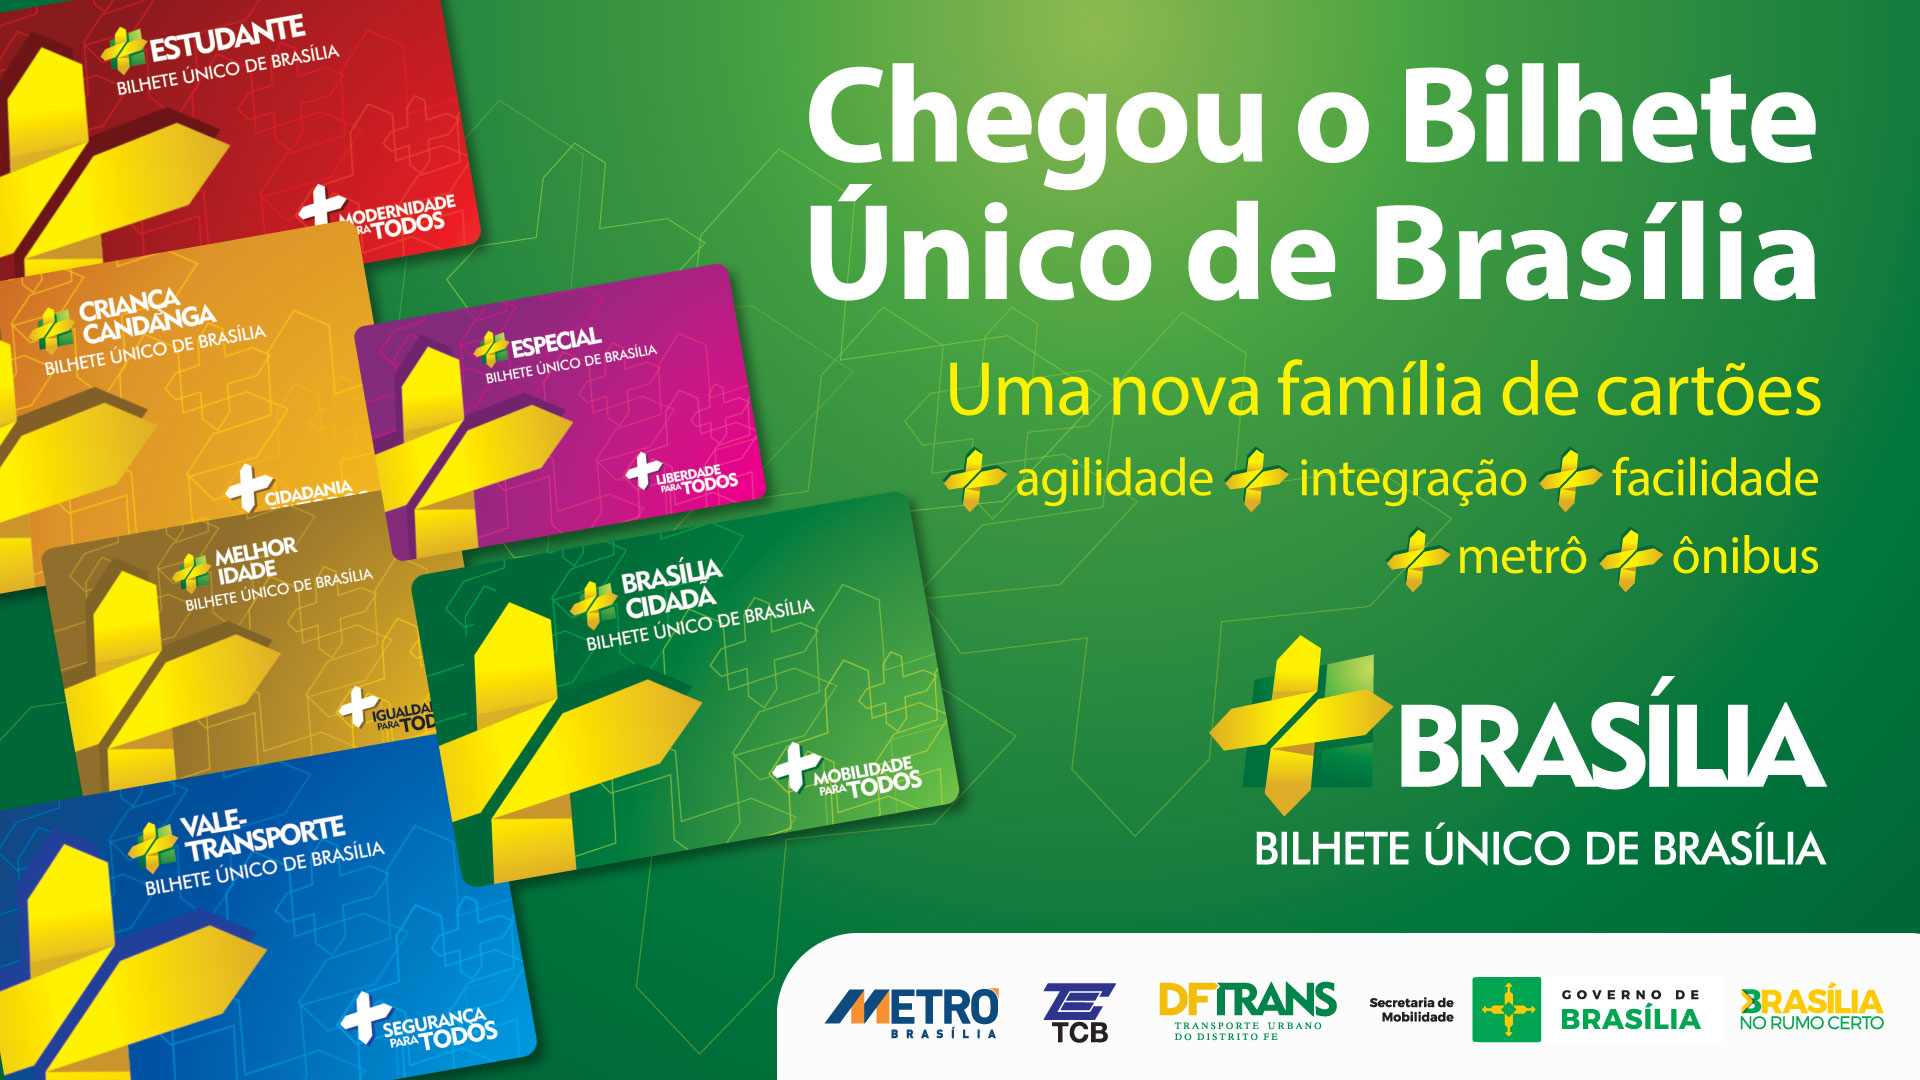 Tire suas dúvidas sobre como utilizar o Bilhete Único de Brasília no Metrô-DF